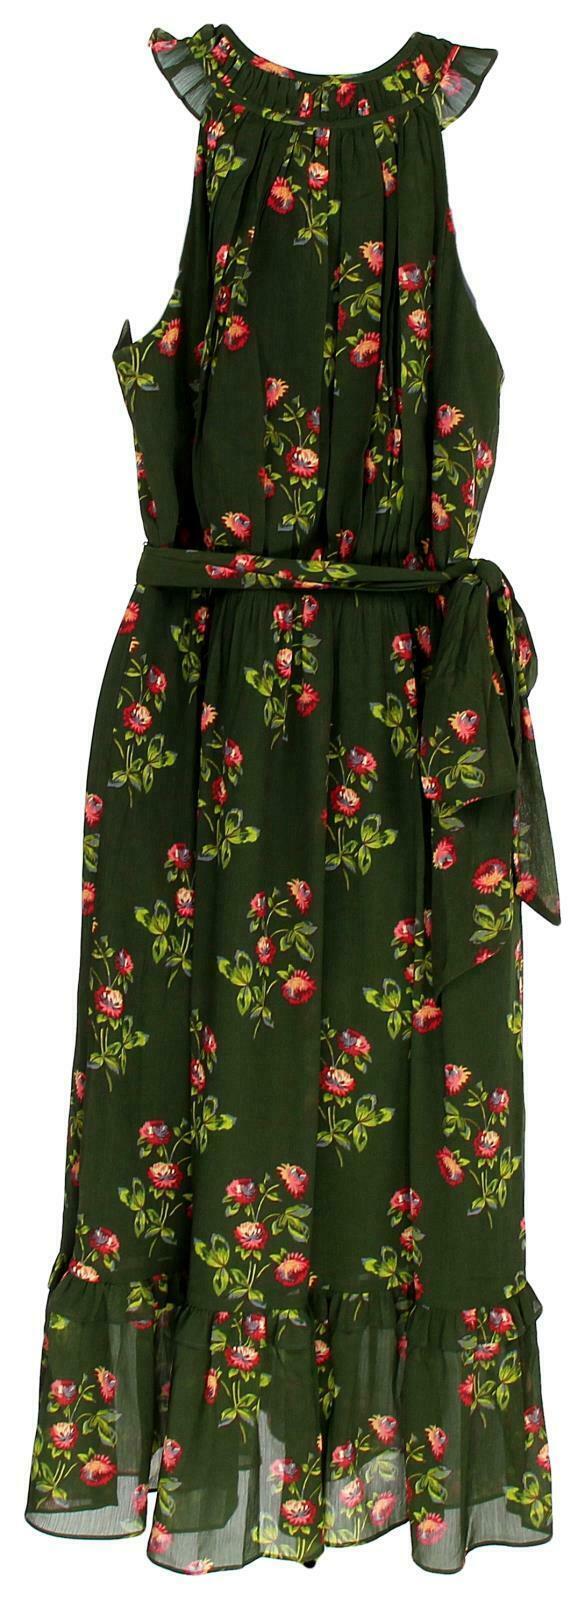 J Crew Women's Point Sur High-Neck Ruffle Floral Dress Chiffon 4 J5088 image 4